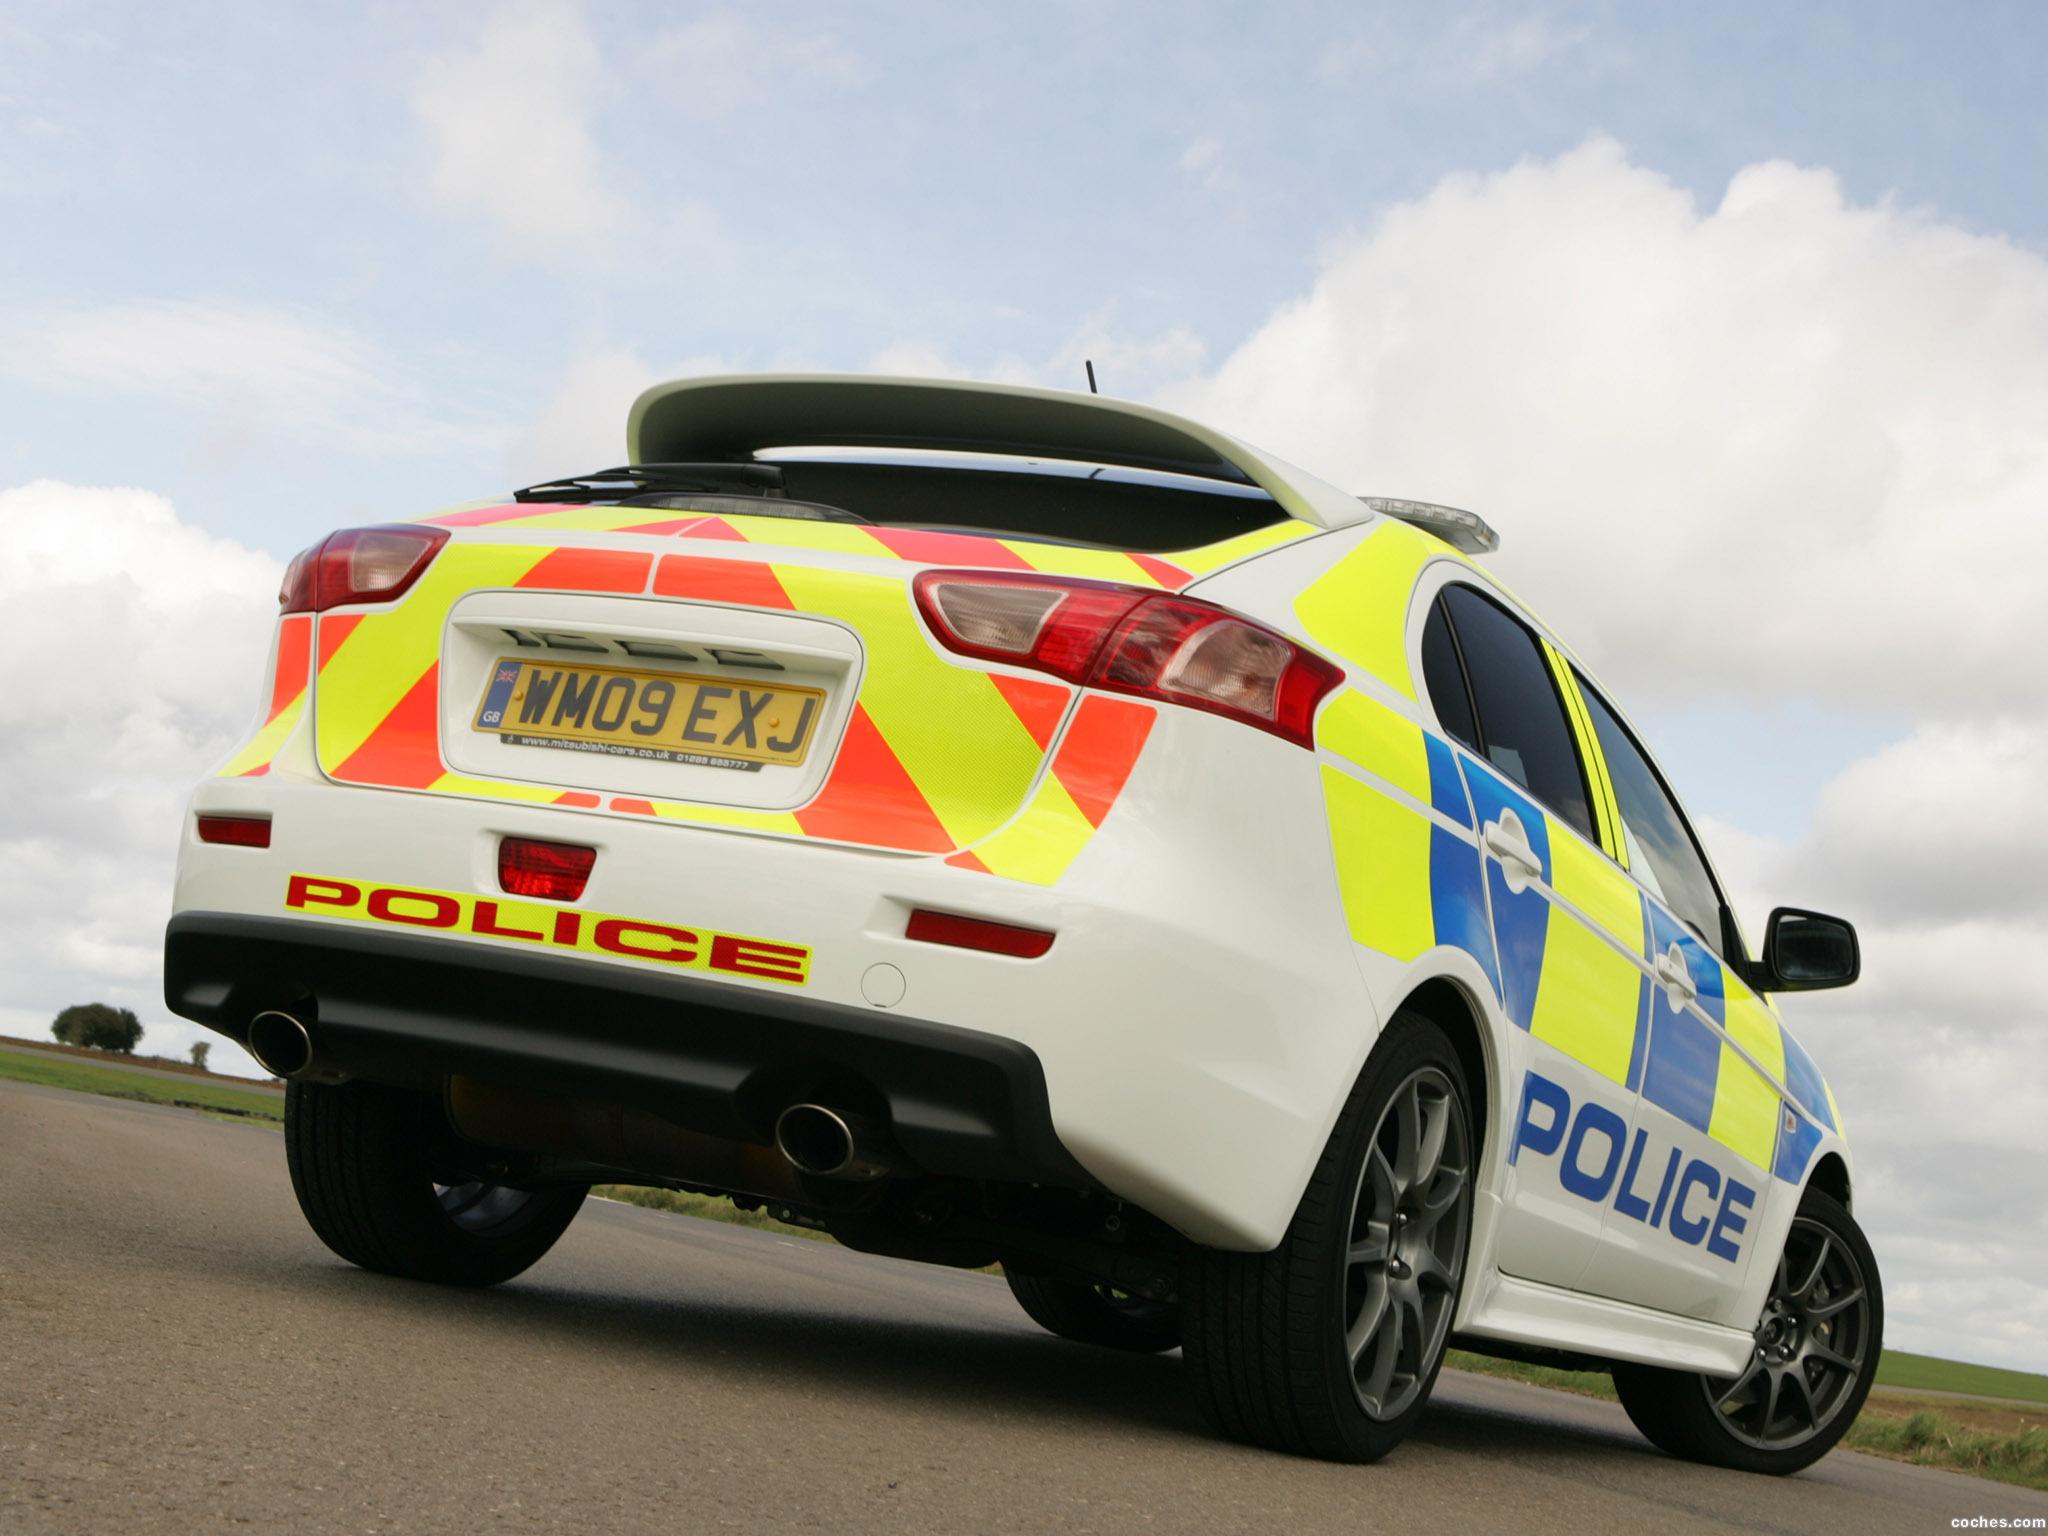 Foto 3 de Mitsubishi Lancer Sportback UK Police 2009